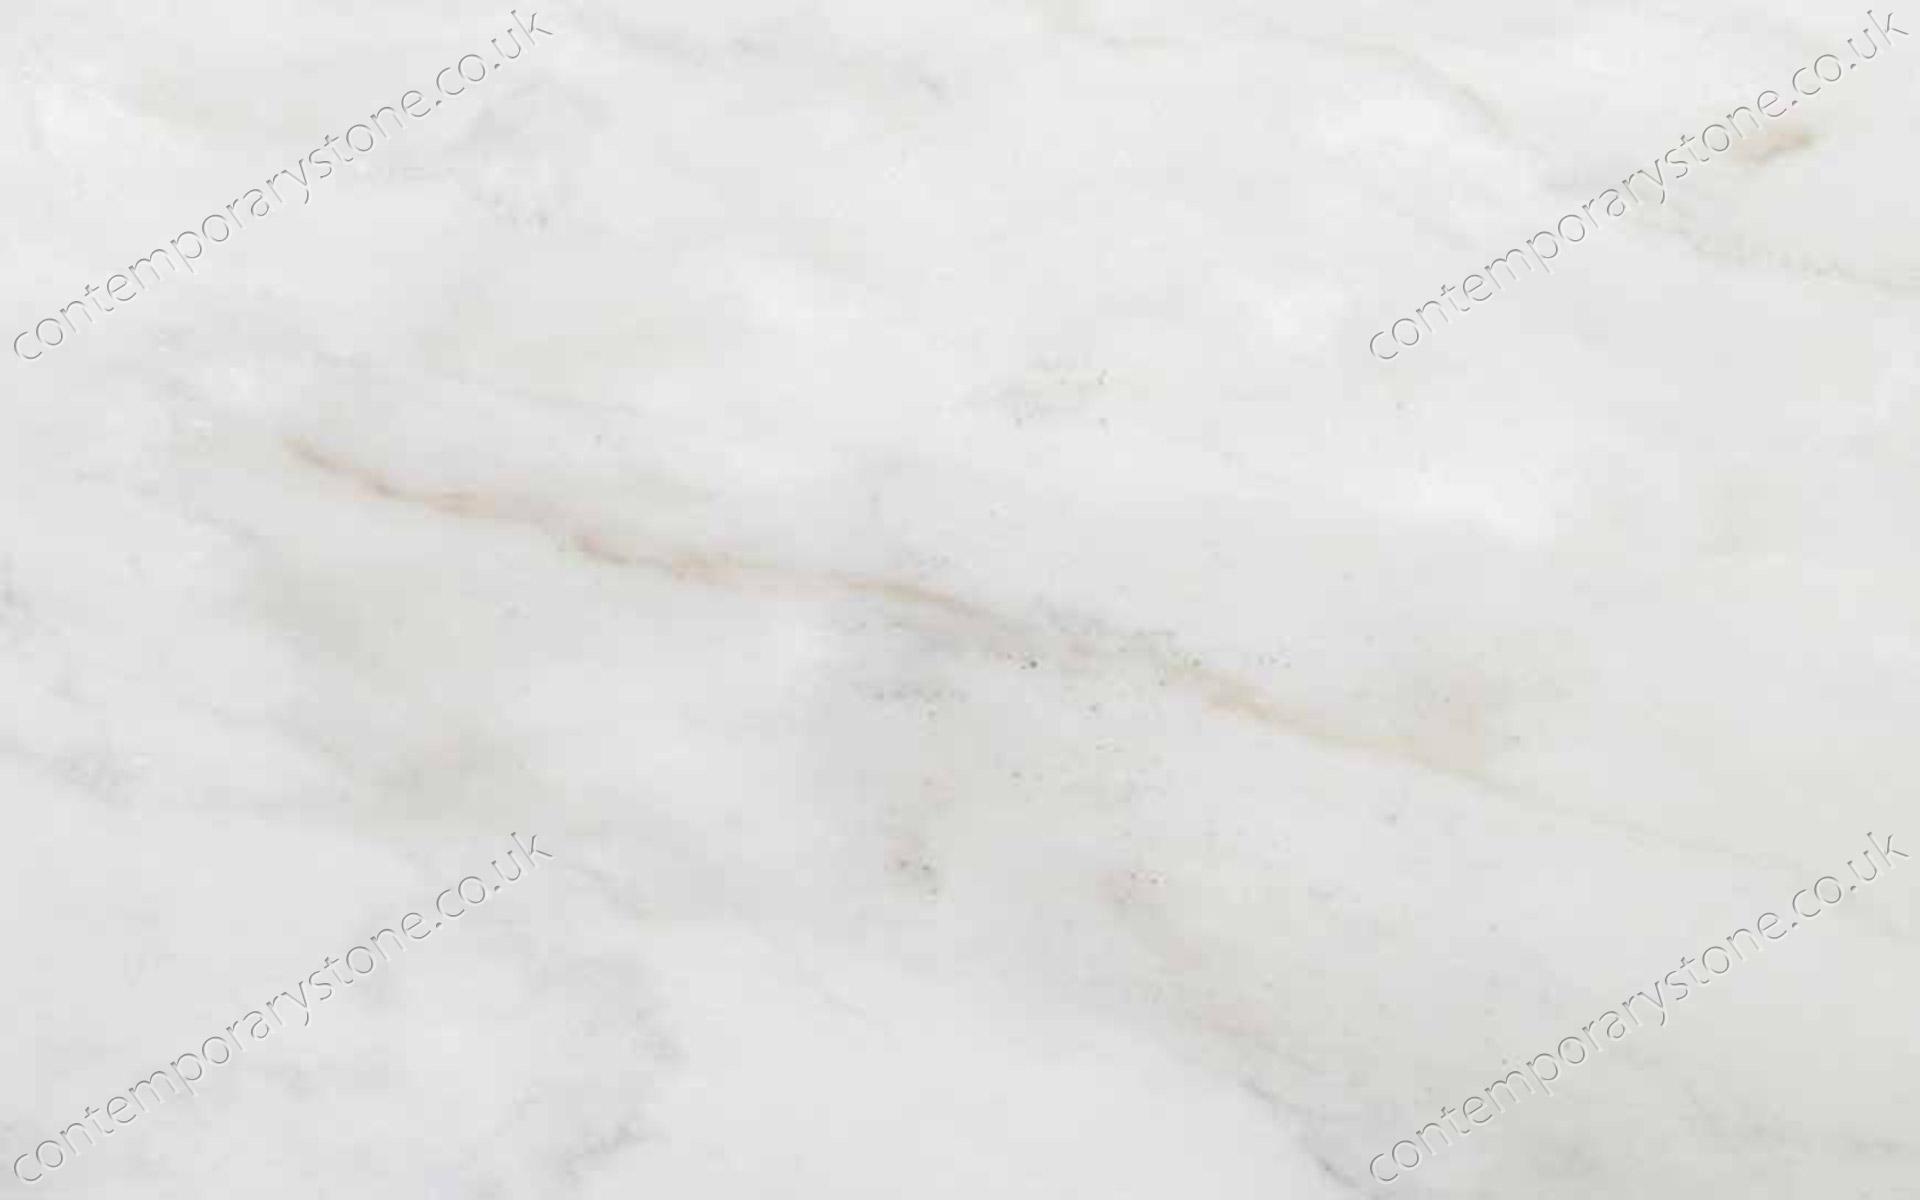 Calacatta Michelangelo marble close-up